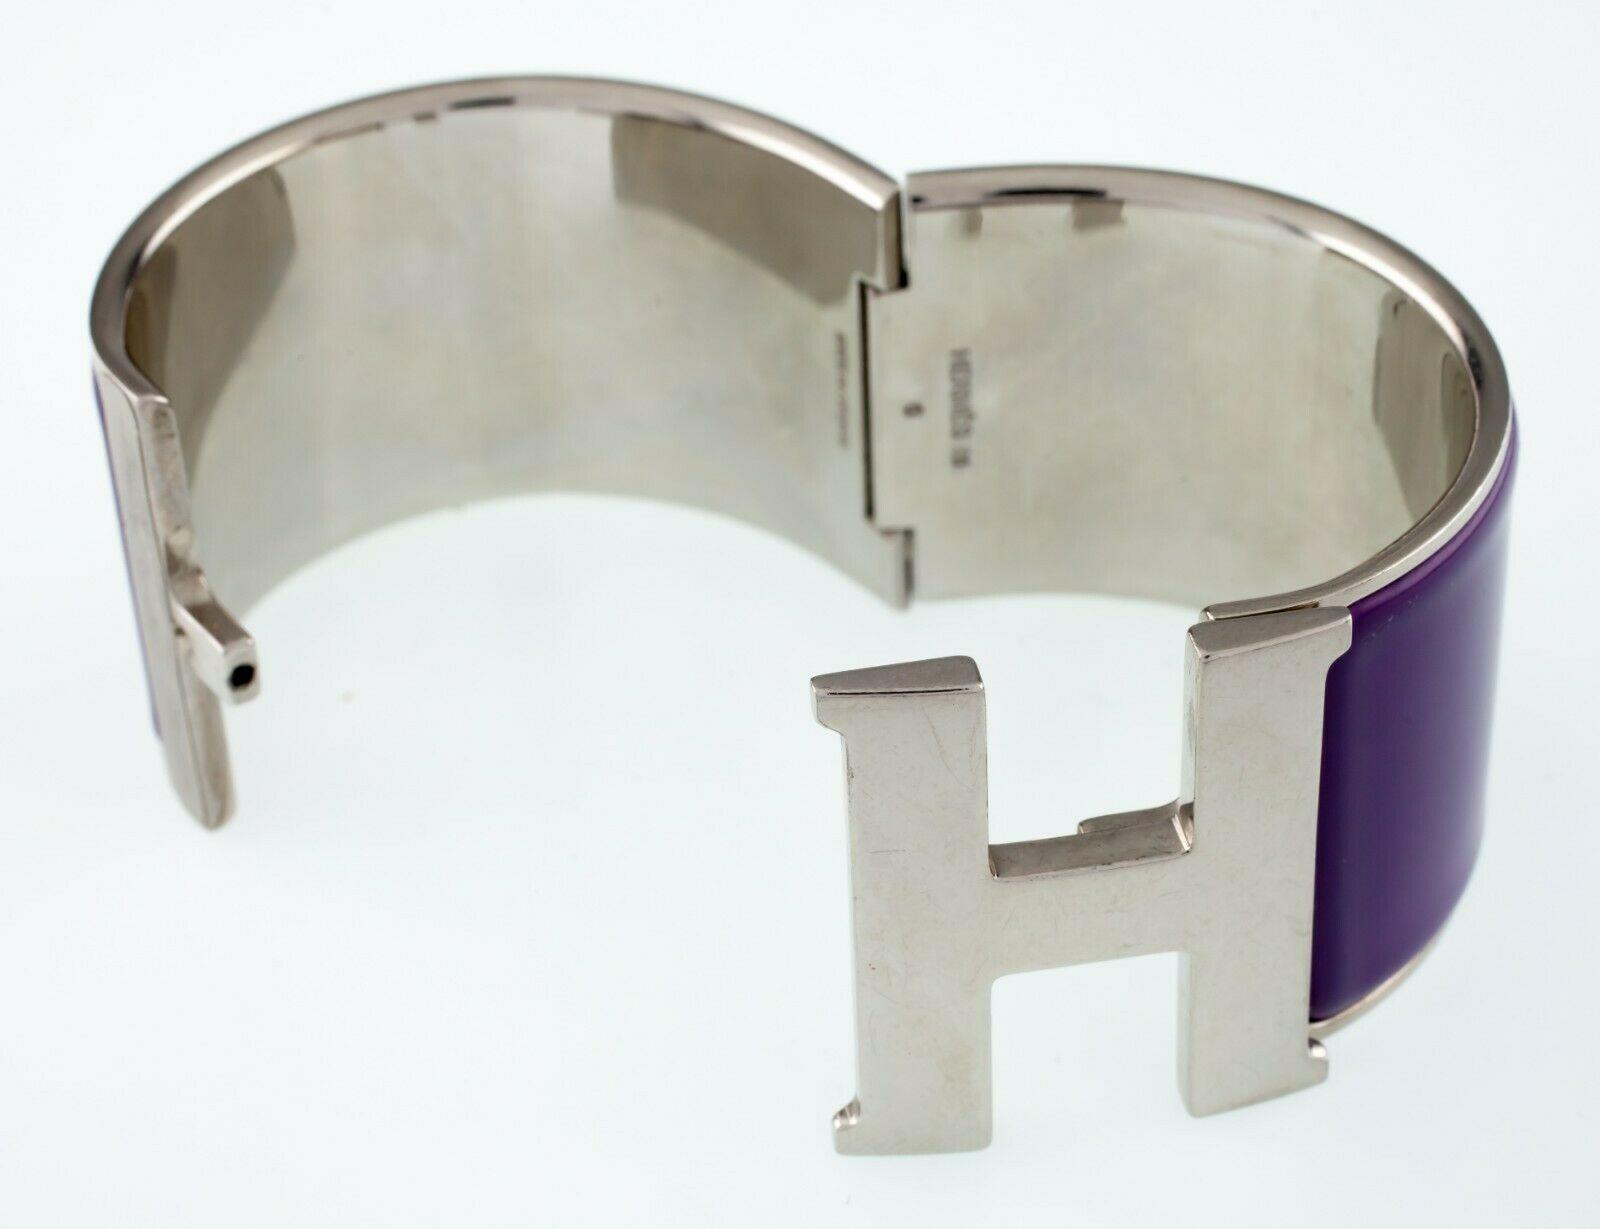 Hermes Clic Clac Violet Extra Large Bracelet Nice! image 5